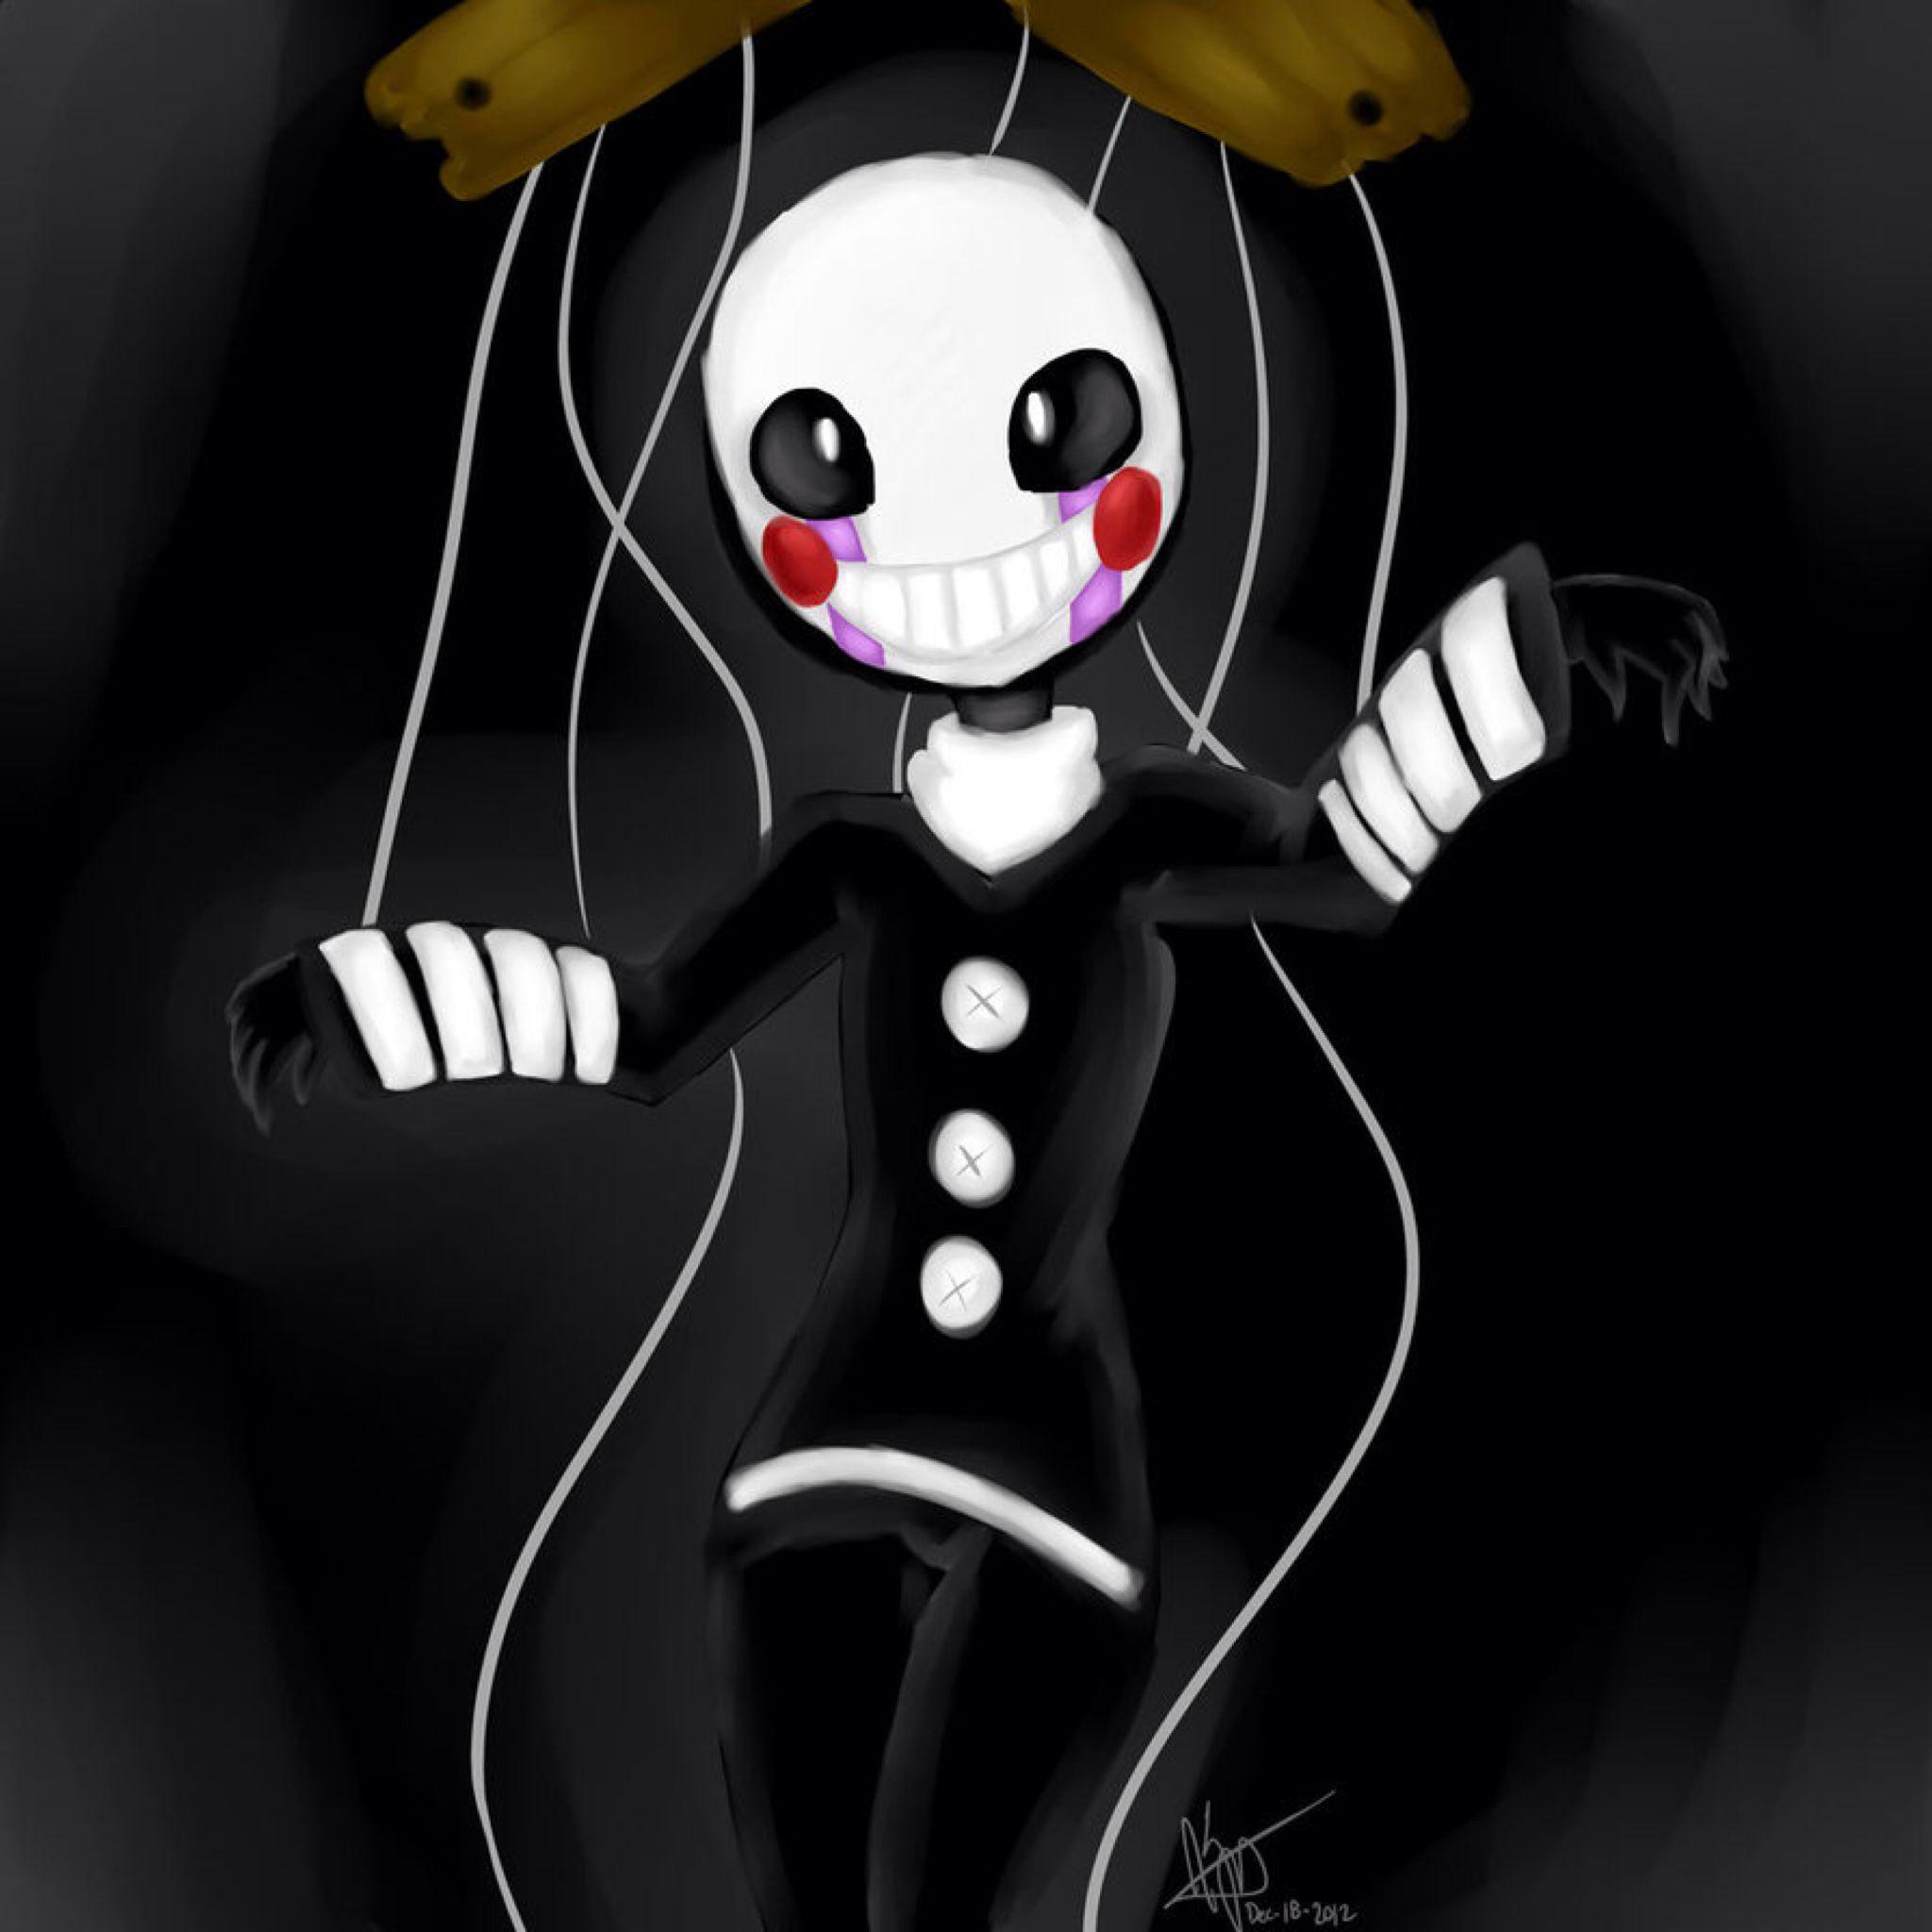 The Puppet By Artiethewolf On @DeviantArt